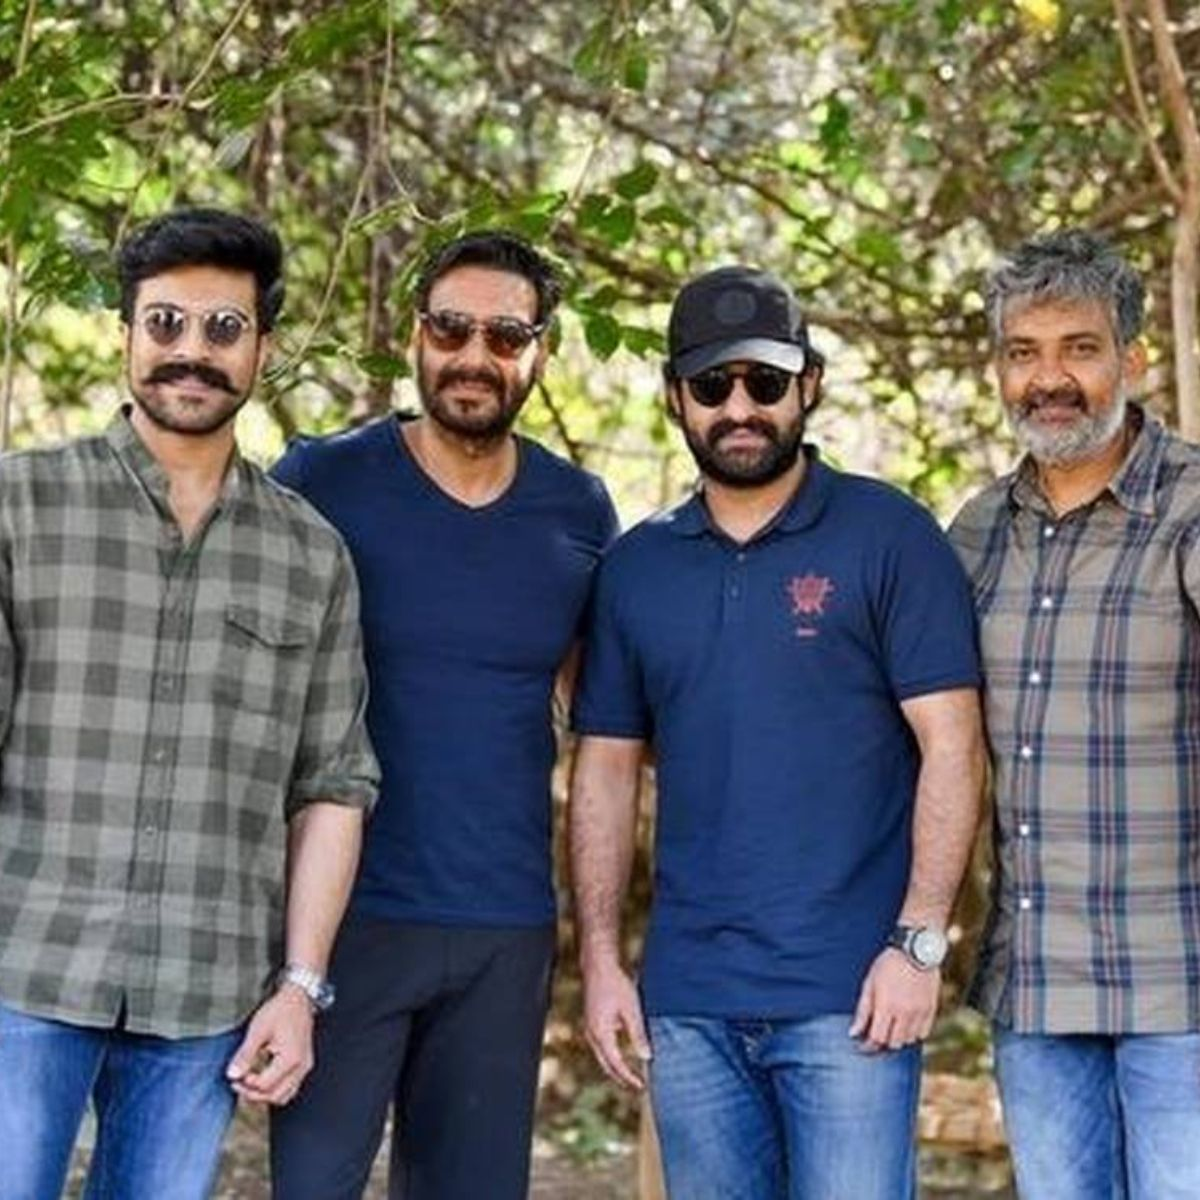 RRR Makers of Ram Charan and Jr NTR starrer resume shoot